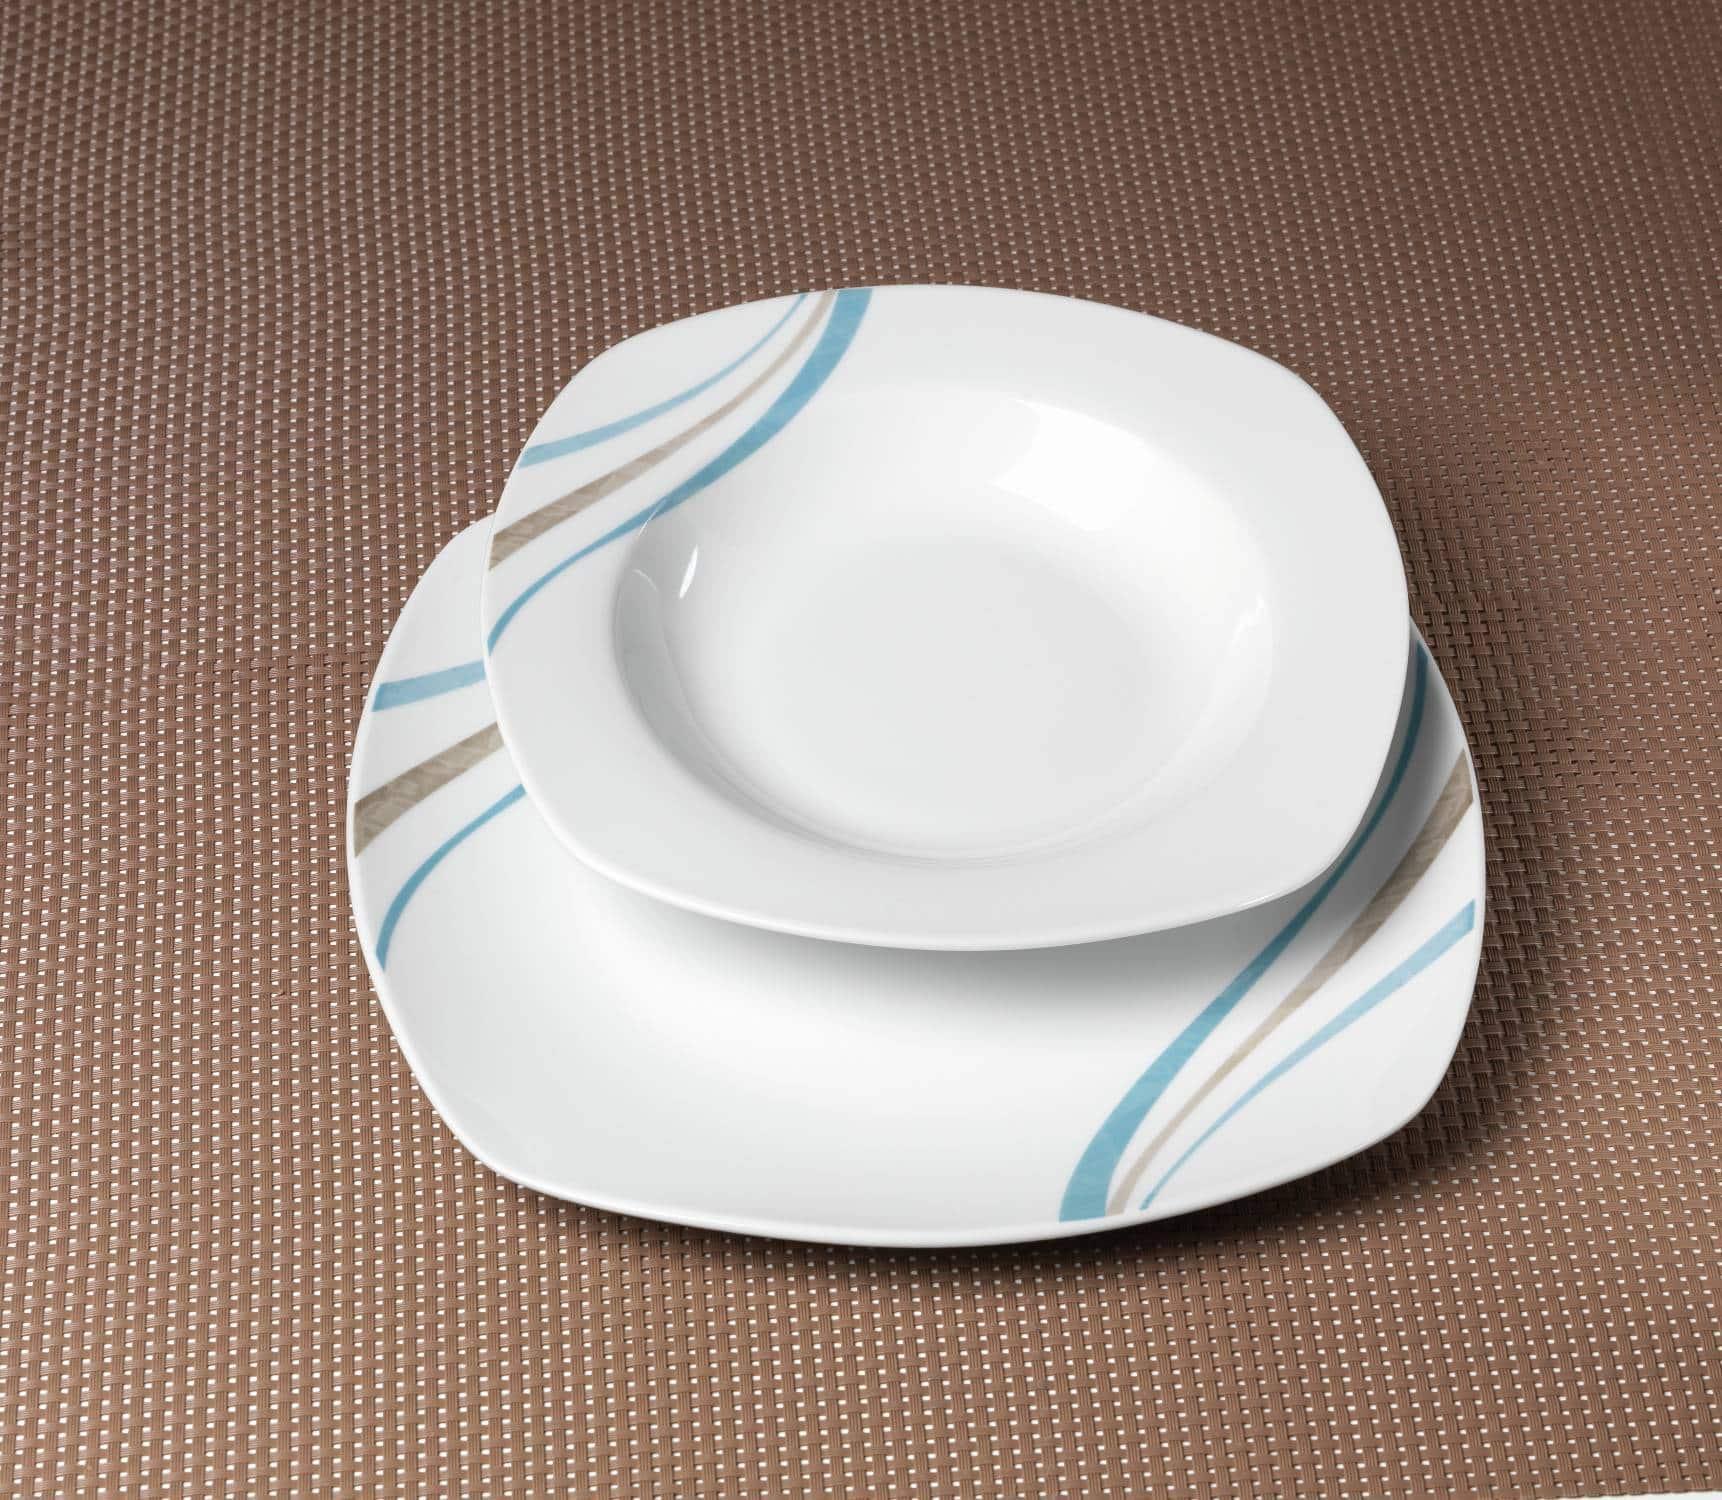 tafelservice flirt Creatable tafelservice, premium - porzellan, 12 teile, »vera« kaufen, creatable tafelservice, porzellan, 12 teile, »roma nature« kaufen, creatable tafelservice, new bone china, »toledo« (12 - teilig) kaufen, flirt by r&b tafelservice, porzellan, »merida« (12tlg) kaufen creatable, creatable, creatable.